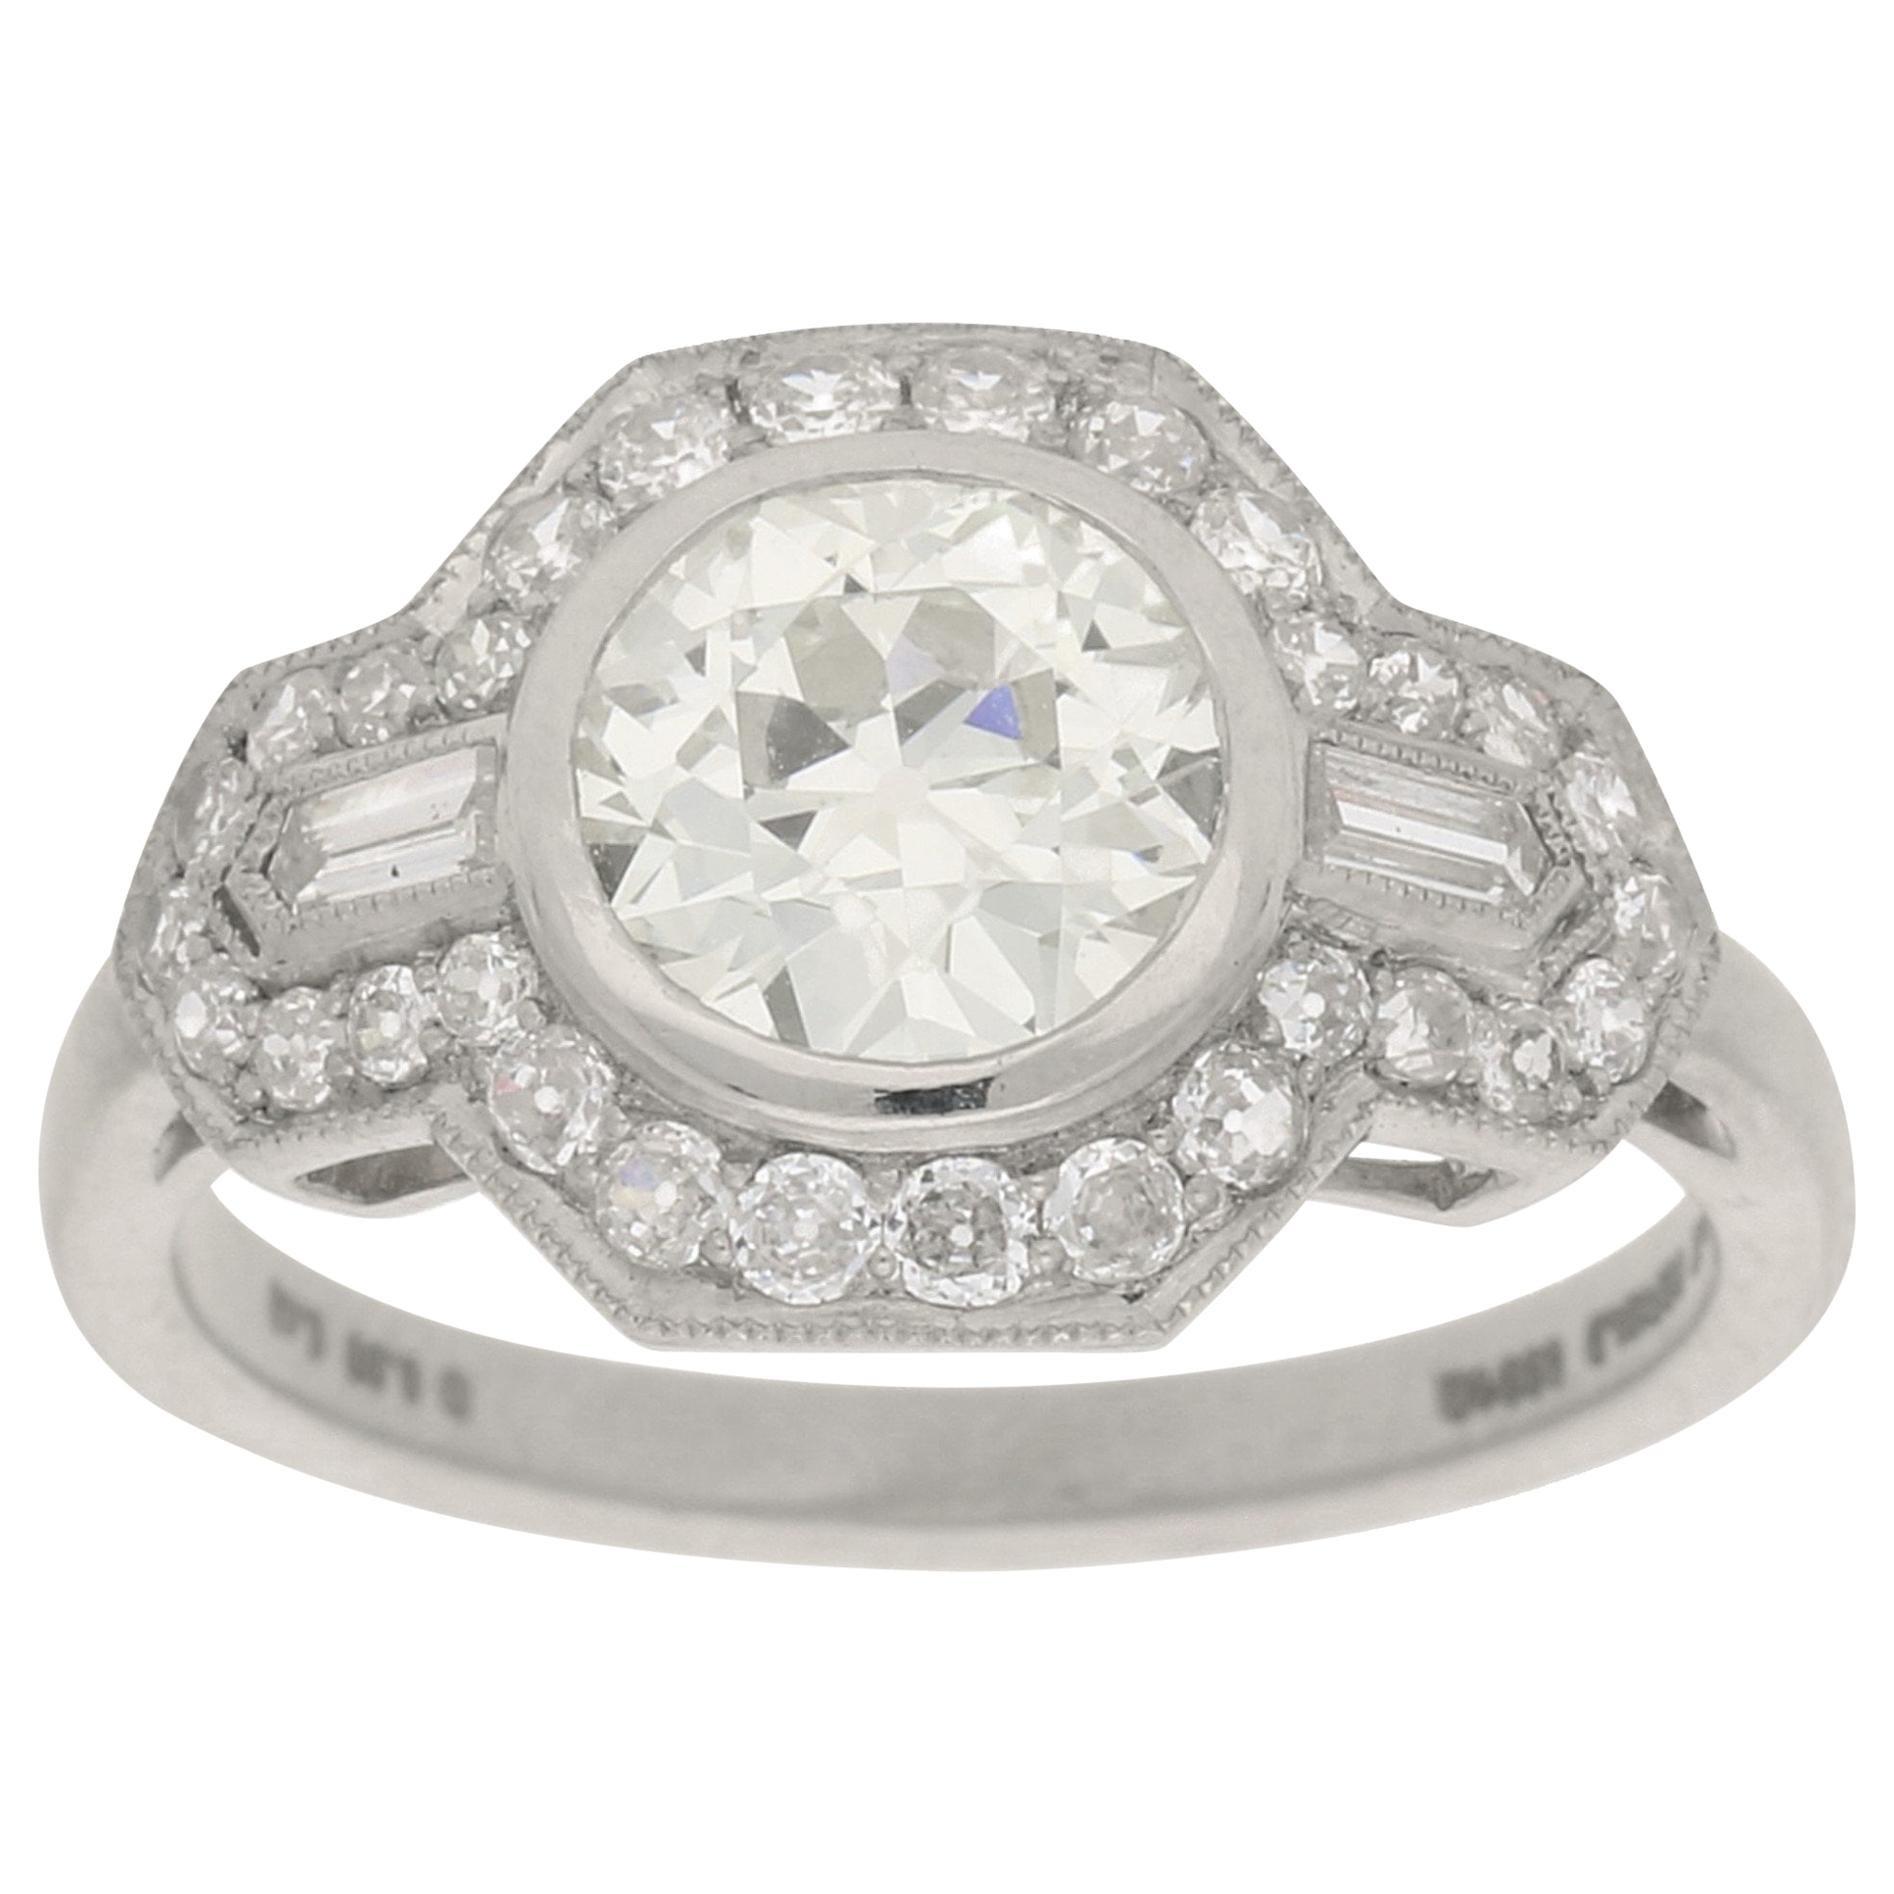 Art Deco Inspired Old European Cut Diamond Engagement Ring Set in Platinum